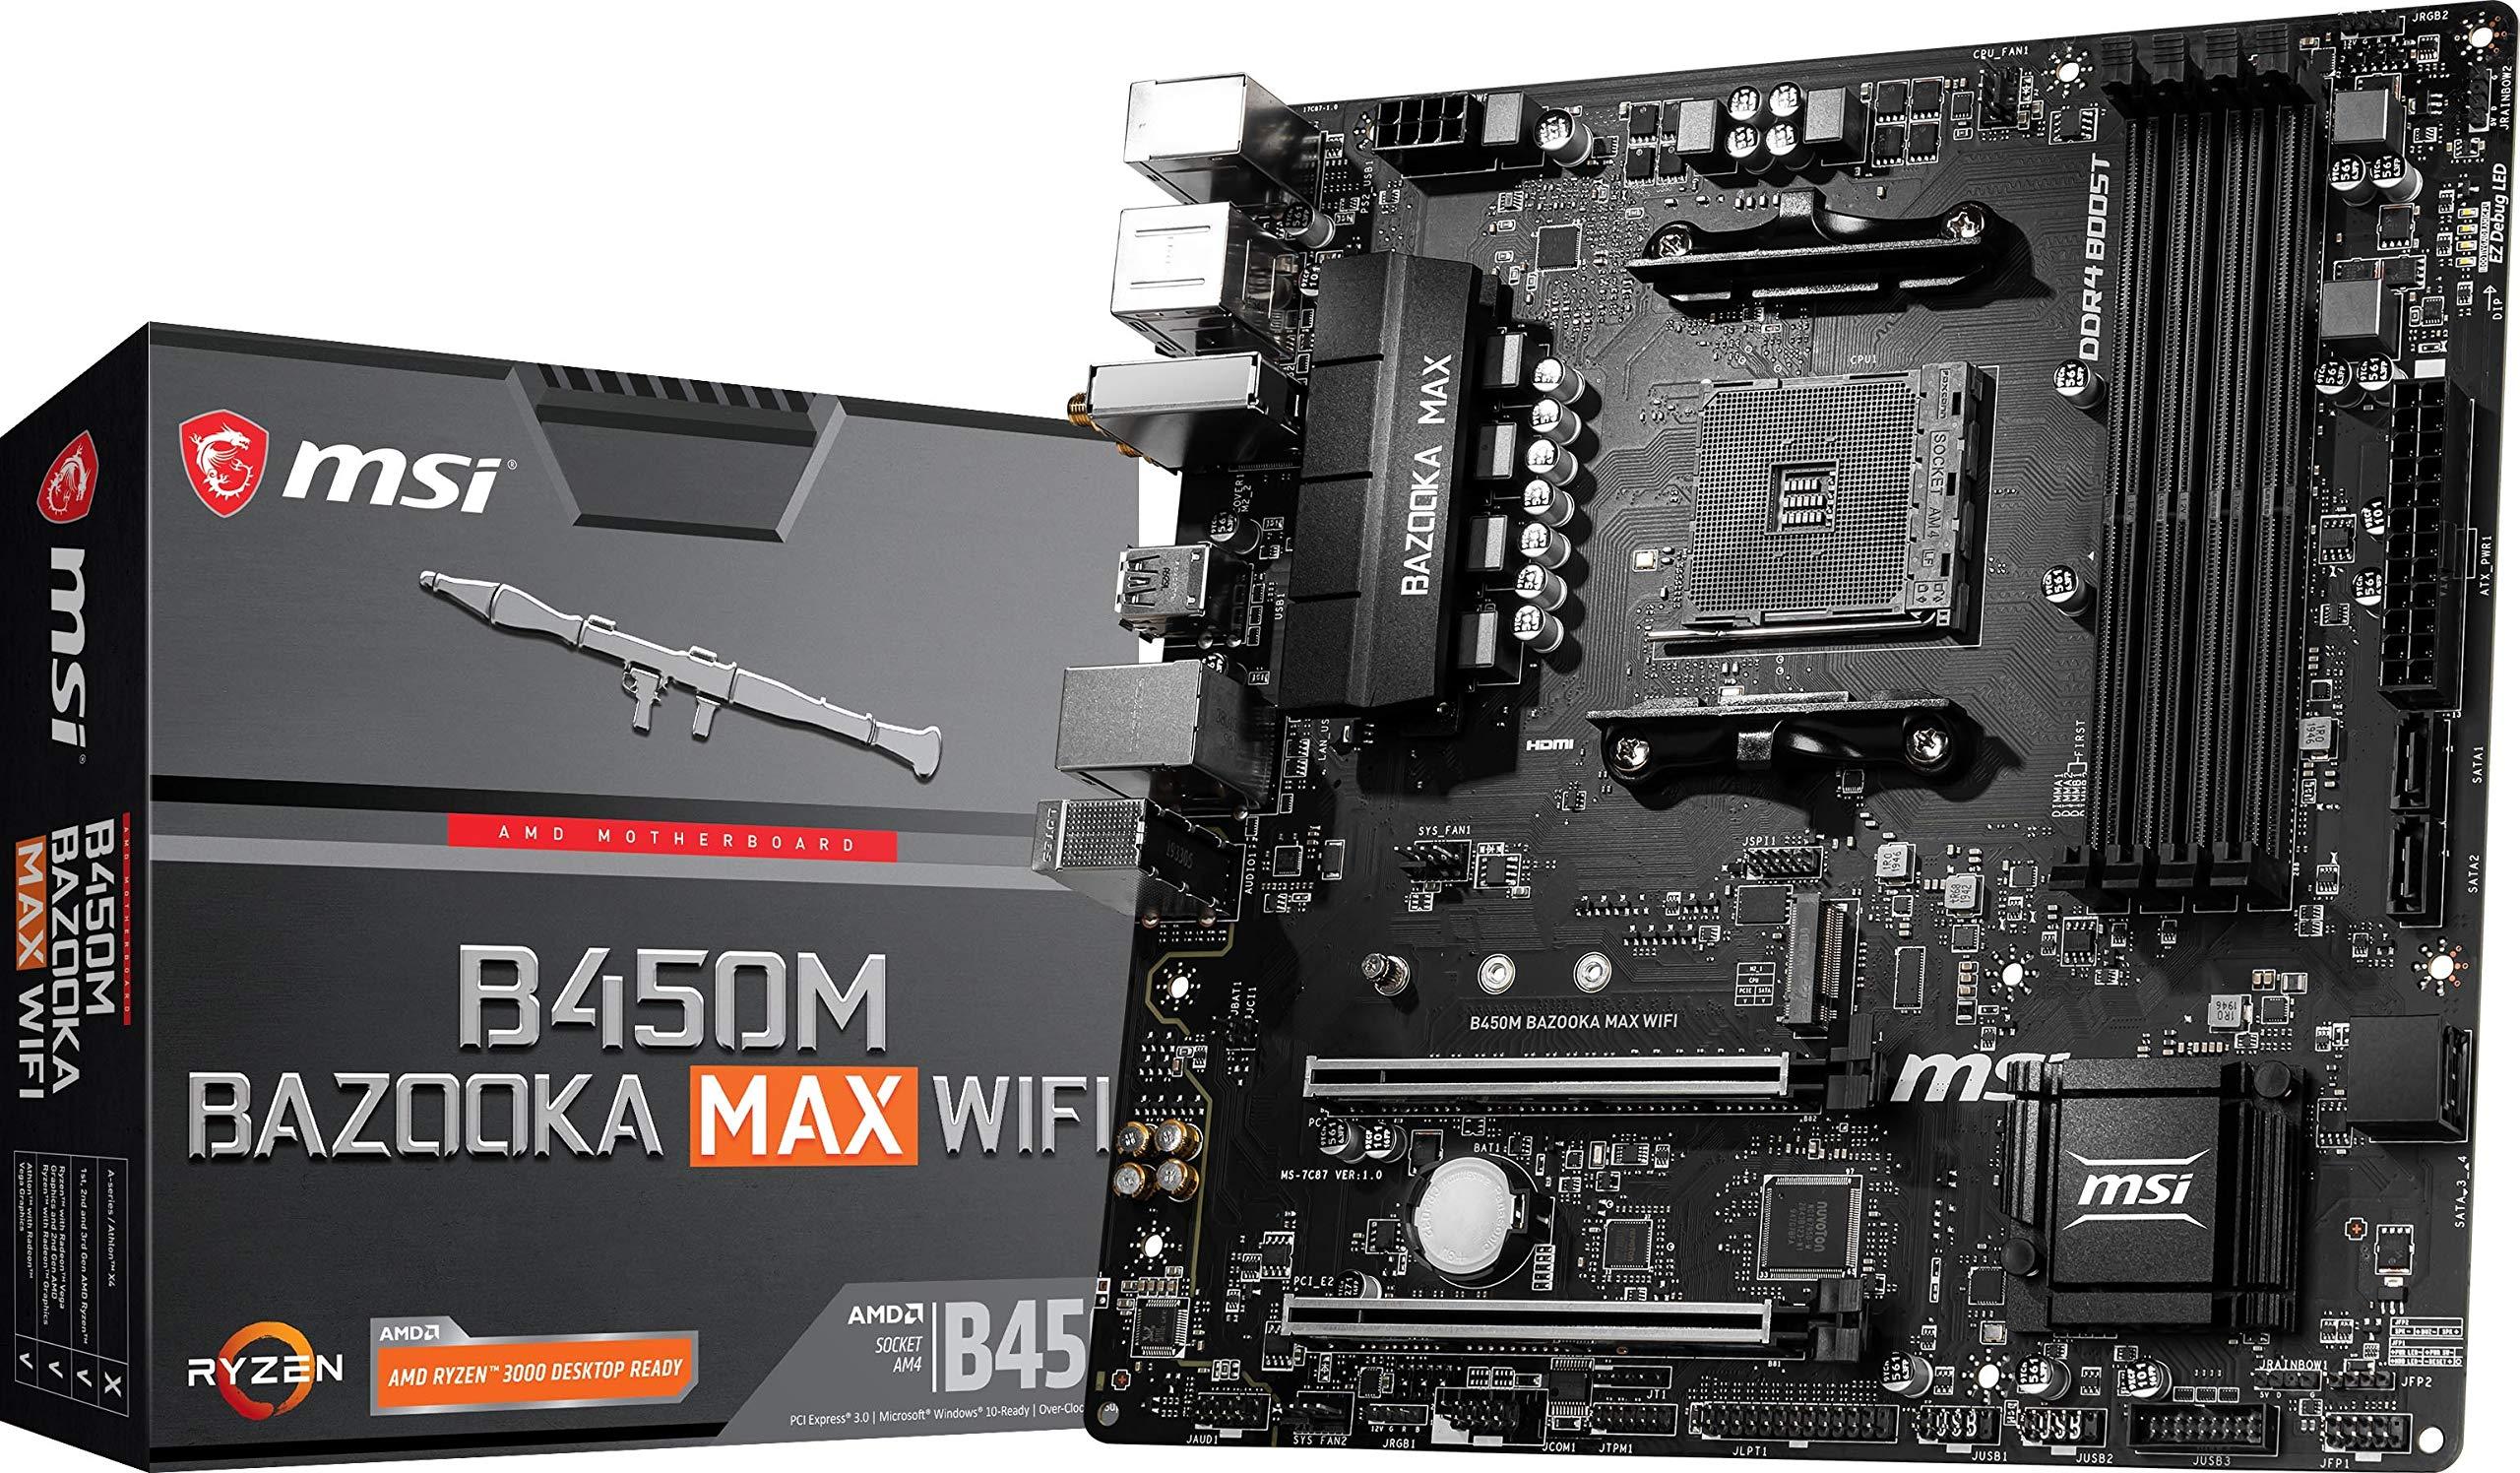 Motherboard MSI B450M BAZOOKA MAX WIFI Socket AM4